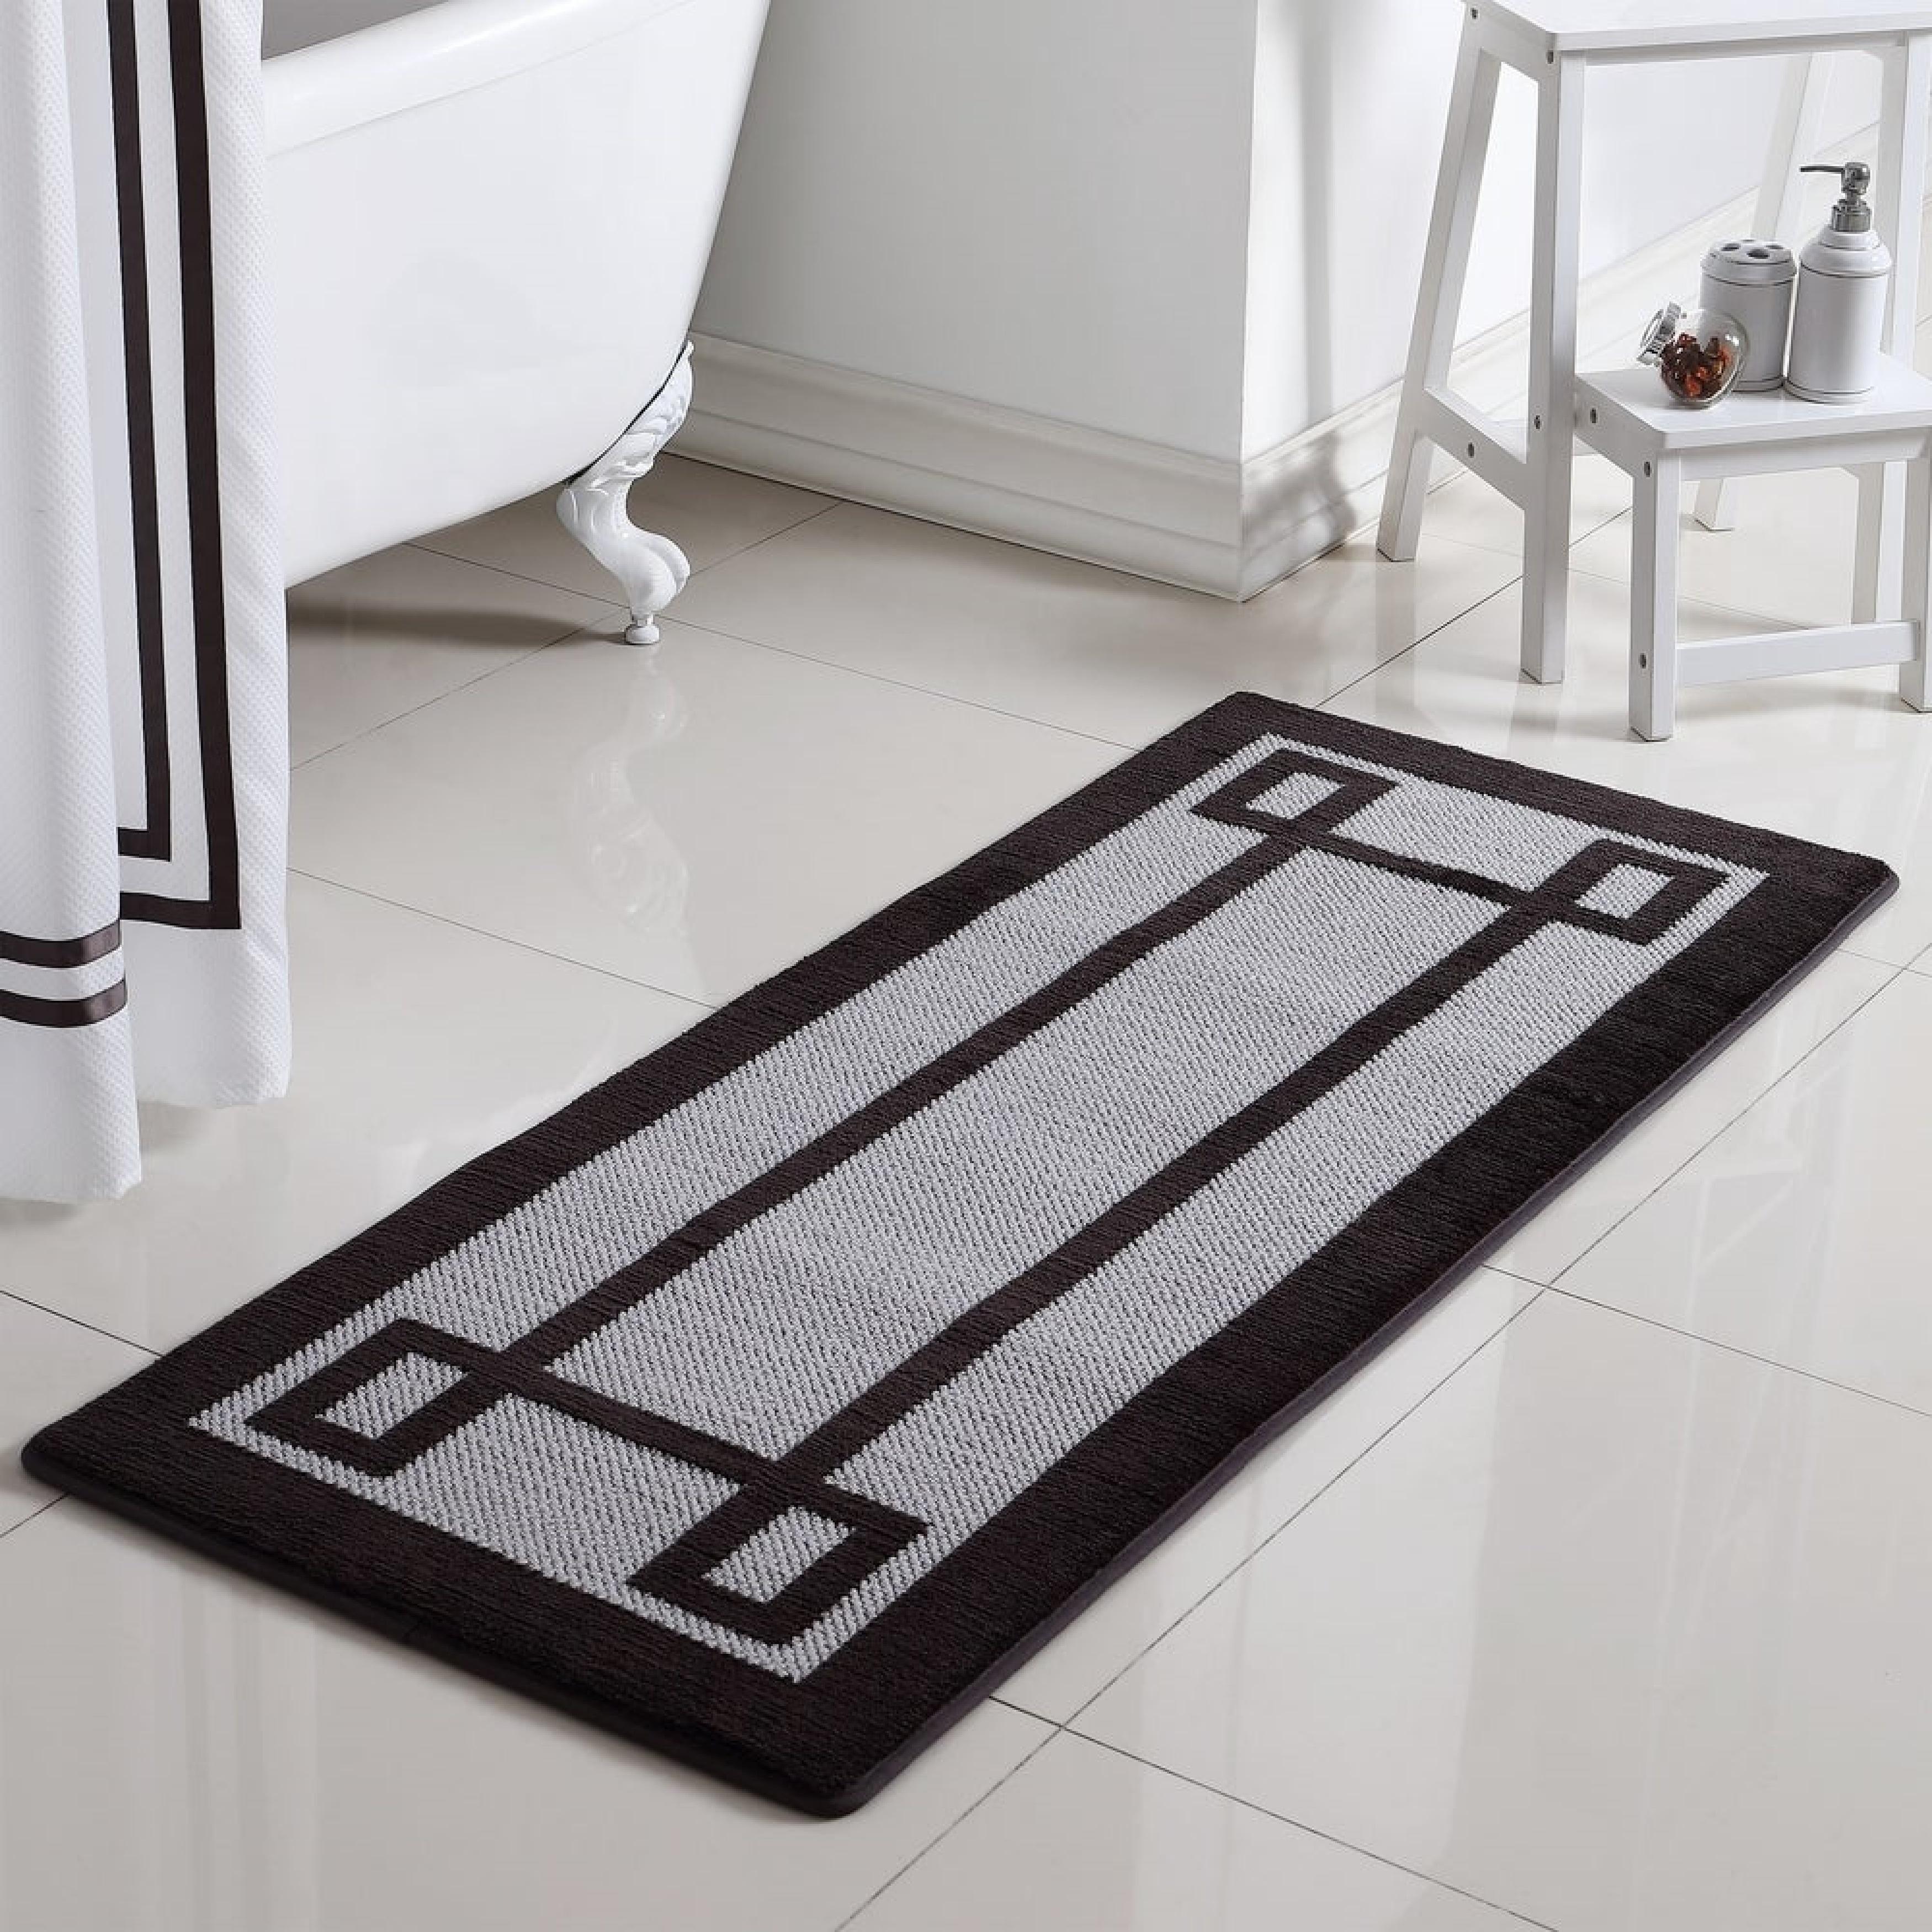 Greek Key Oversized 2 Tone Memory Foam Bath Rug Runner On Sale Overstock 30574781